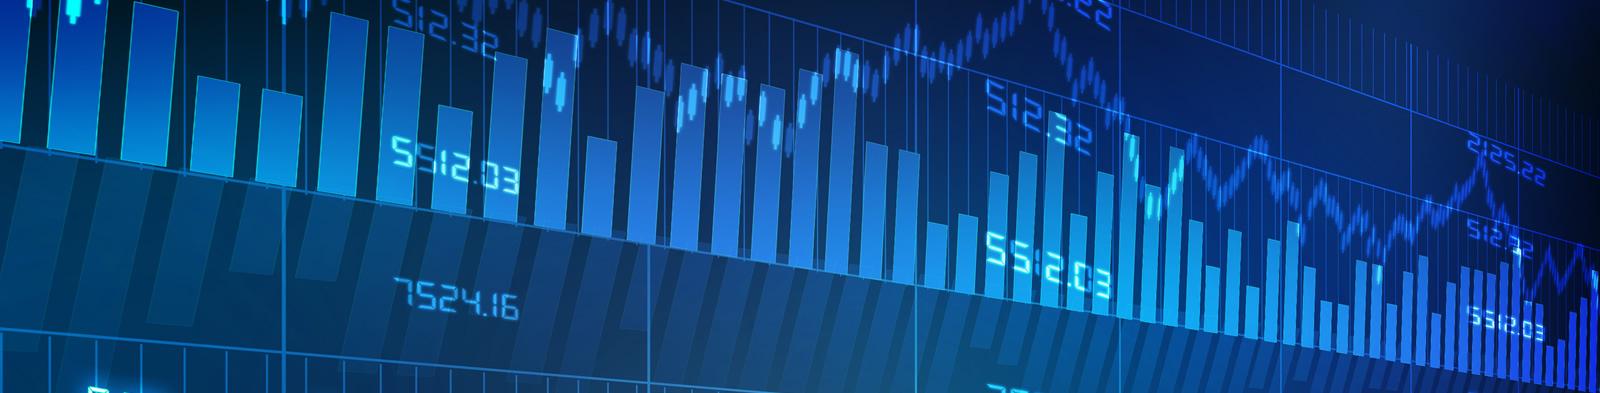 Luminous graphic of investment graphs